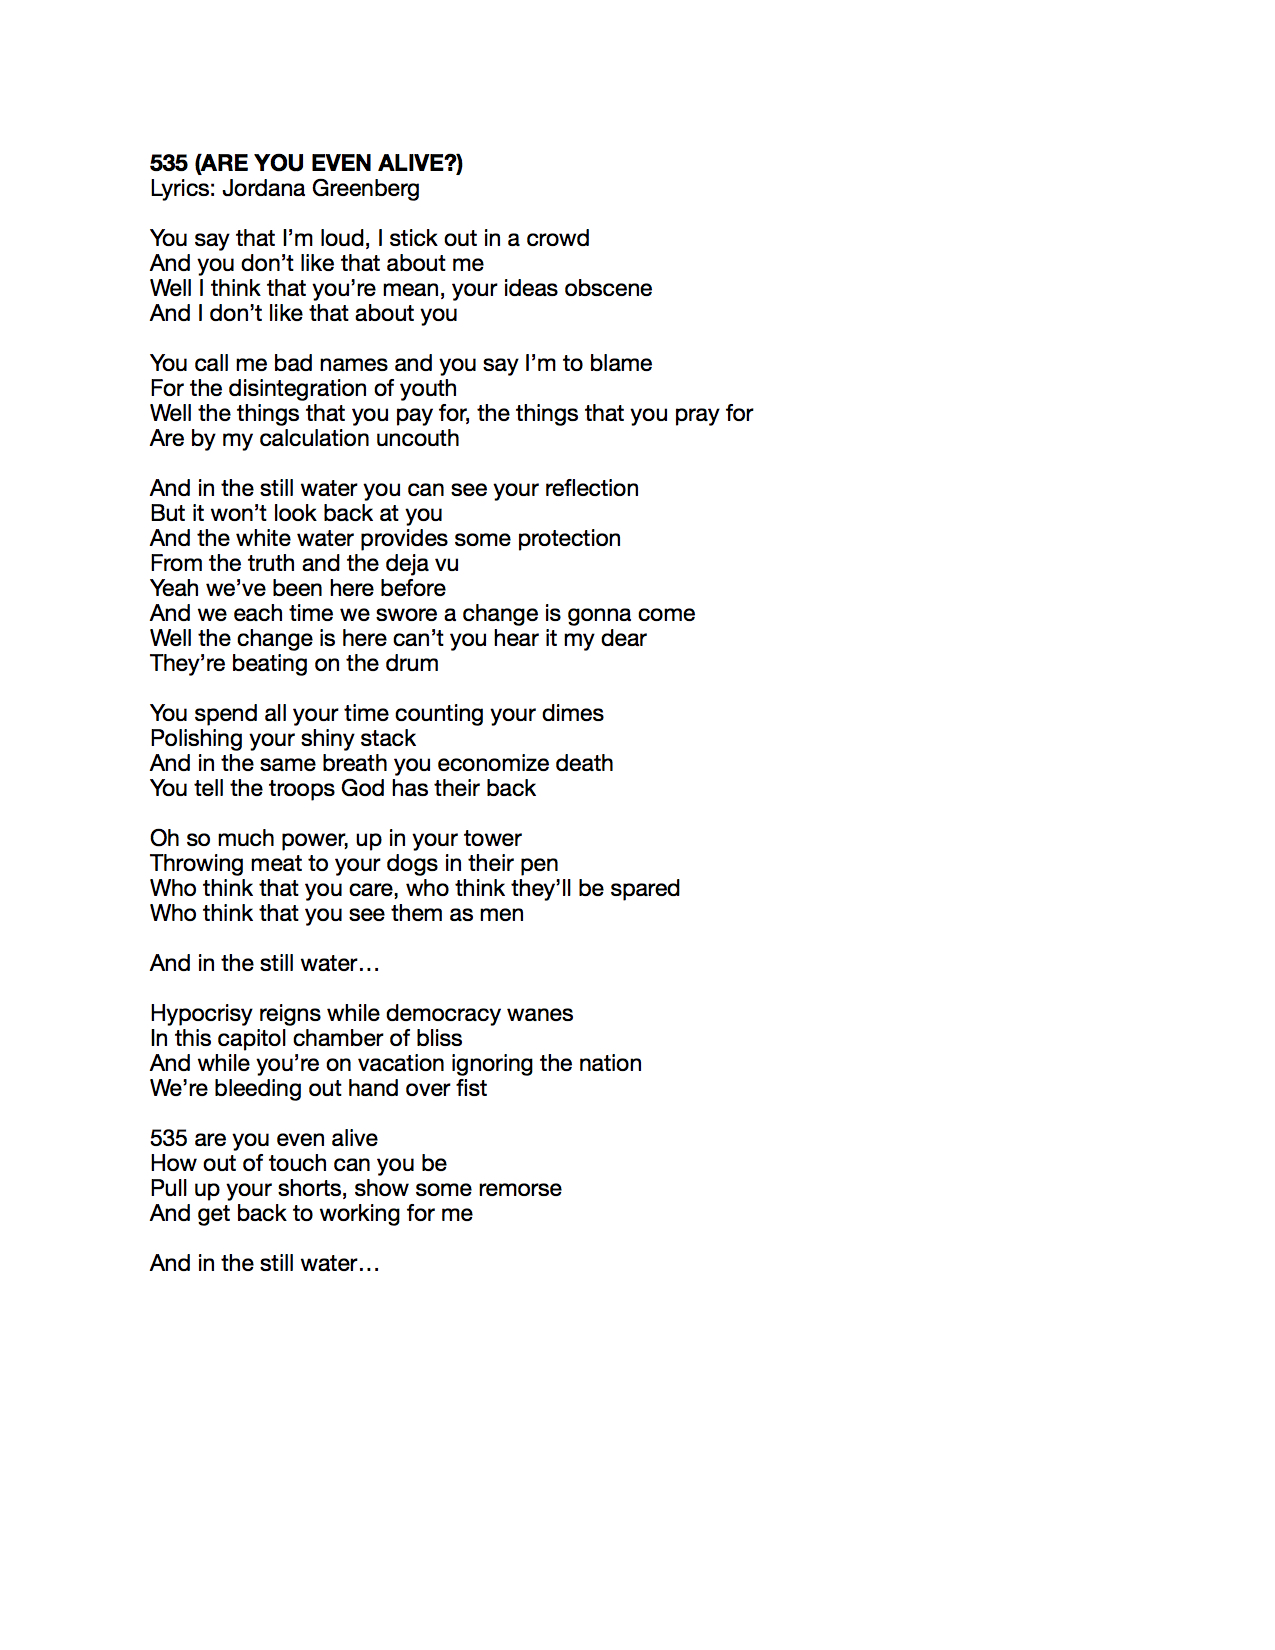 535 Lyrics.jpg